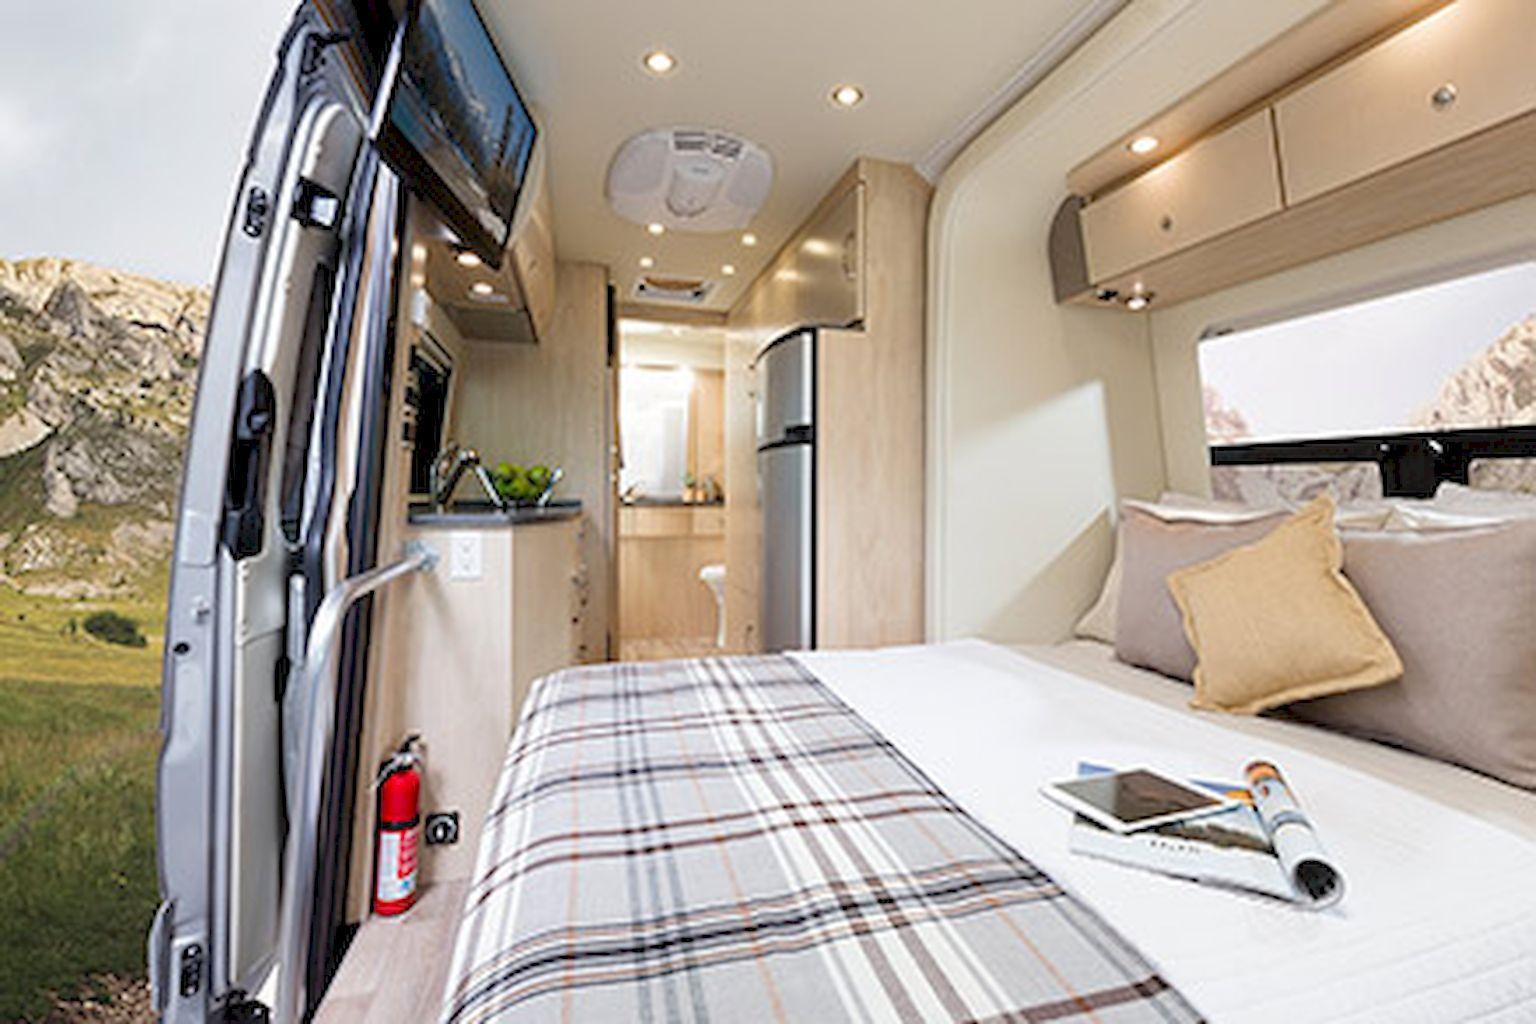 65 Inspiring Van Camper Interiors Decor Ideas On A Budget